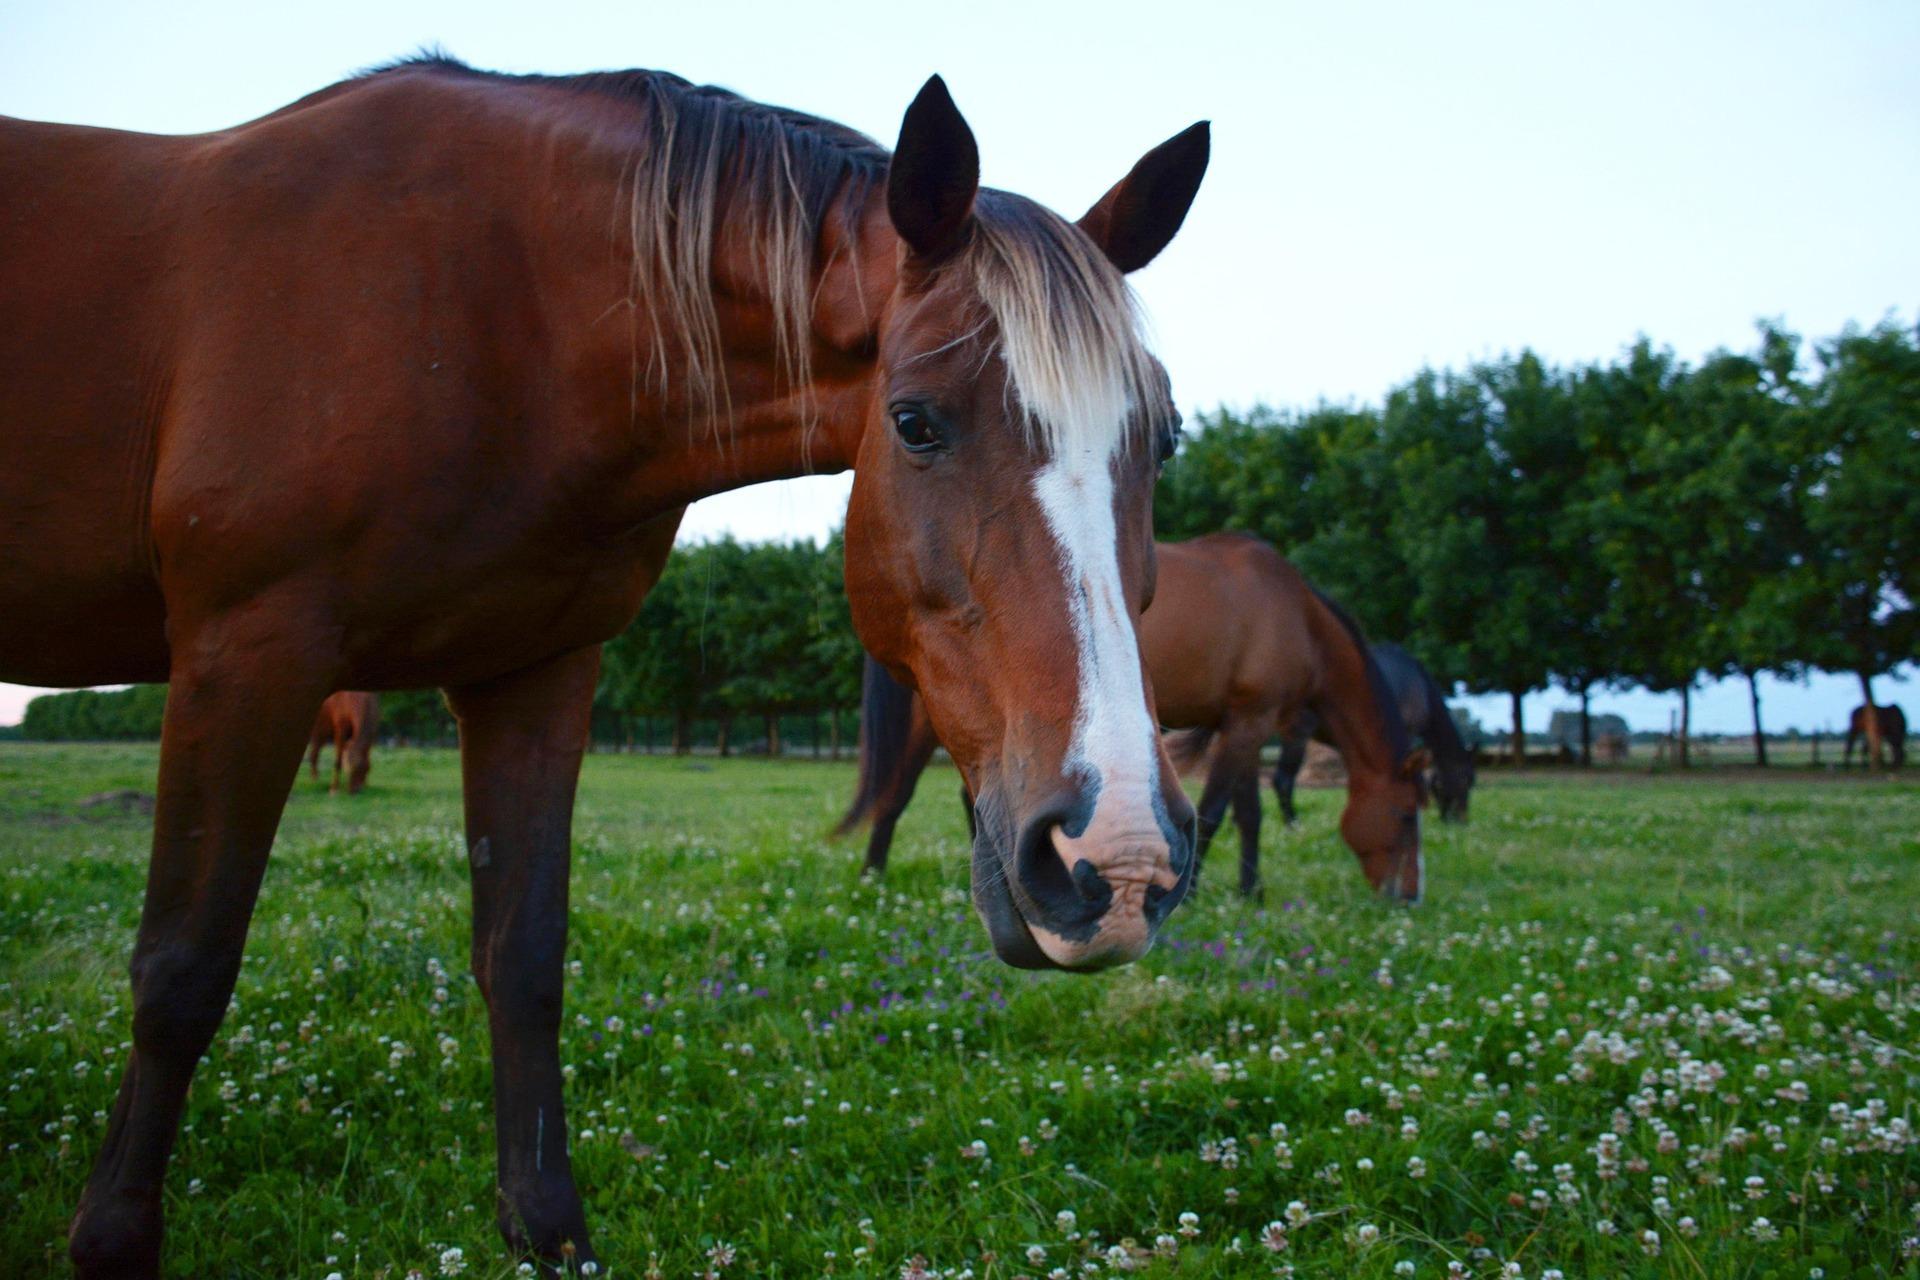 horse-2536539_1920.jpg